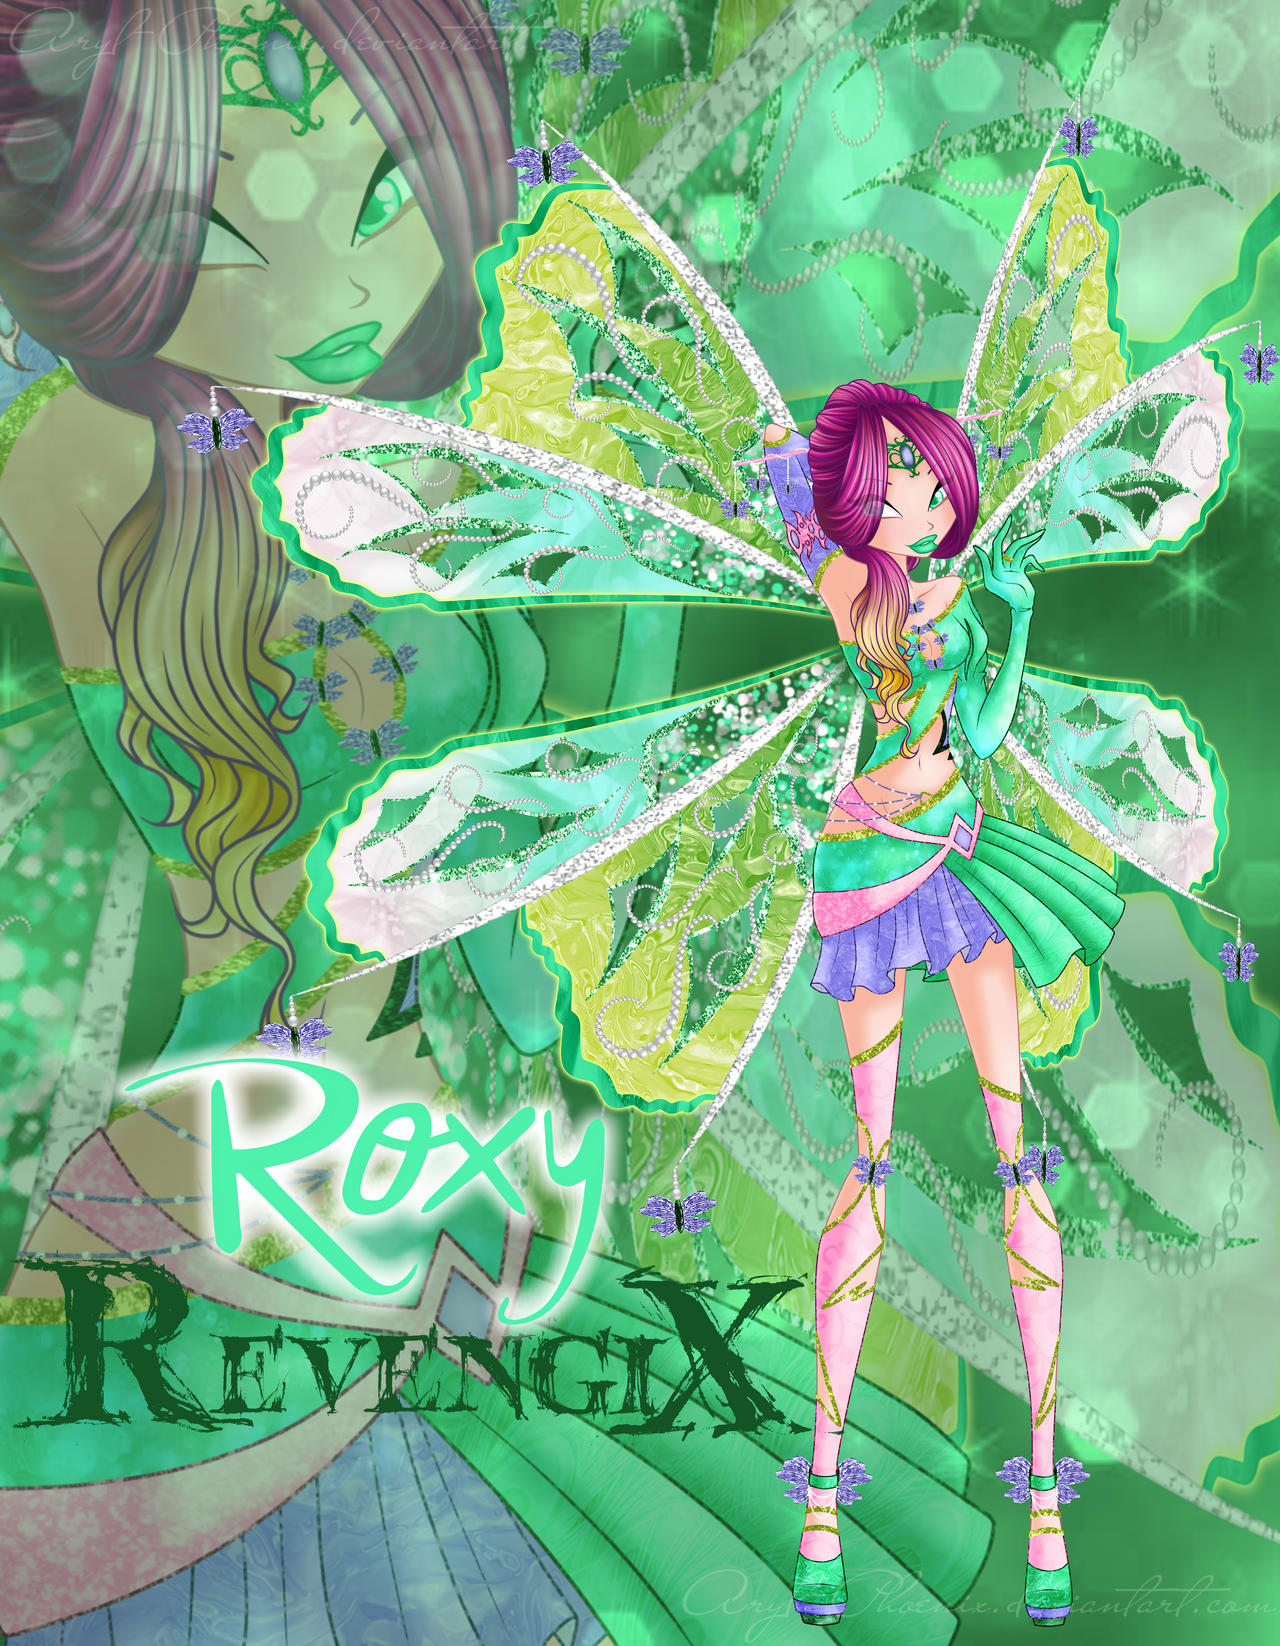 Roxy Revengix by Aryl-Phoenix on DeviantArt